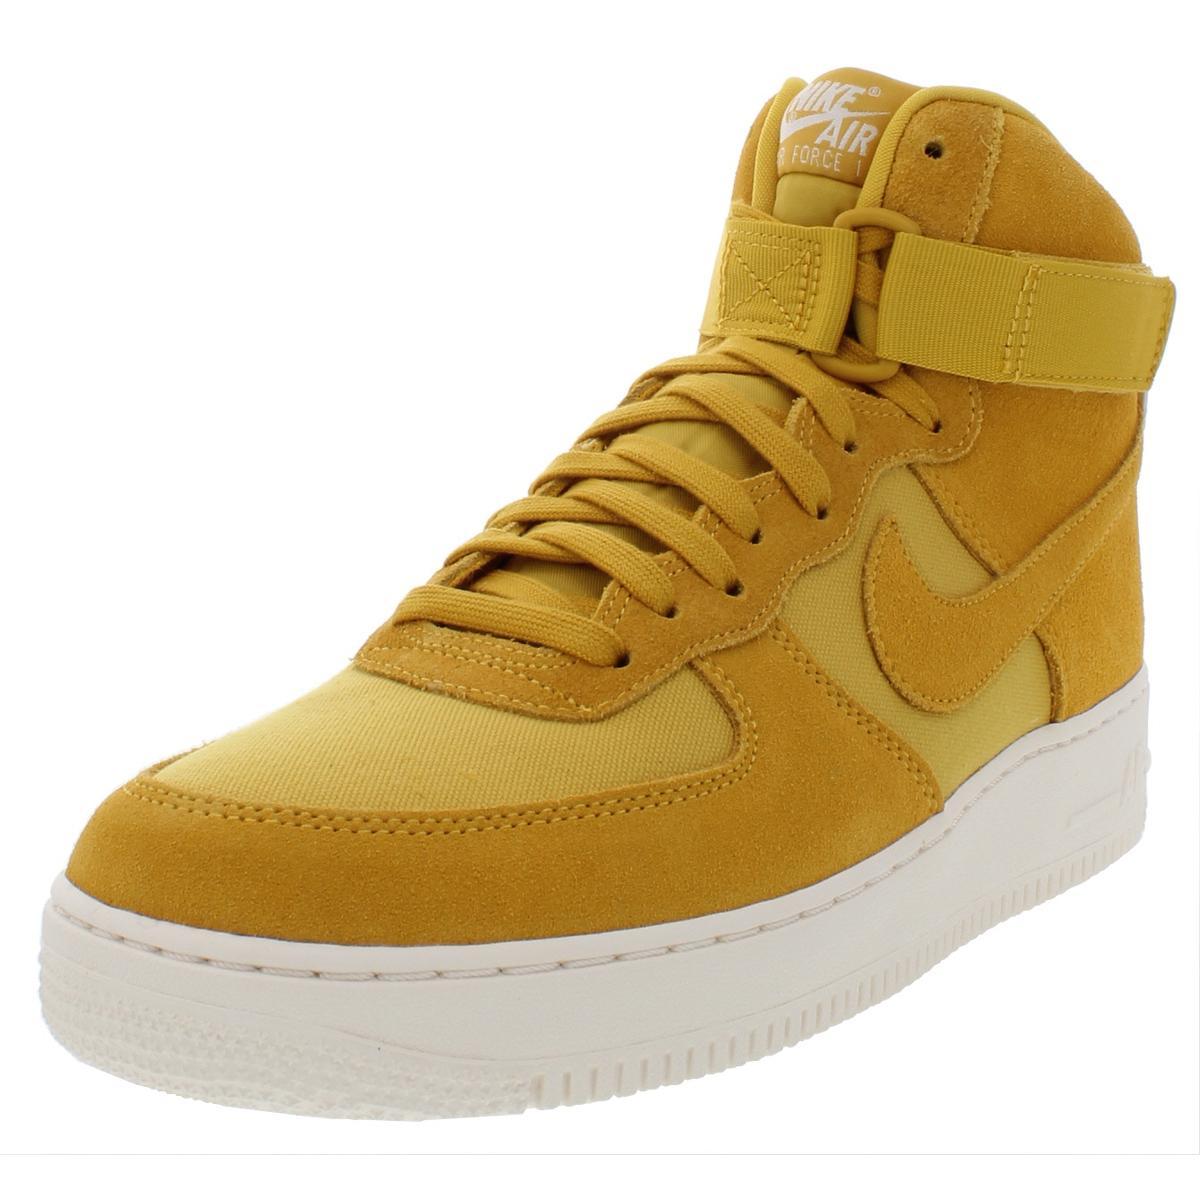 online store 5e6f2 ed92b Nike Air Force 1 High  07 Mens High Top Basketball Fashion Sneakers